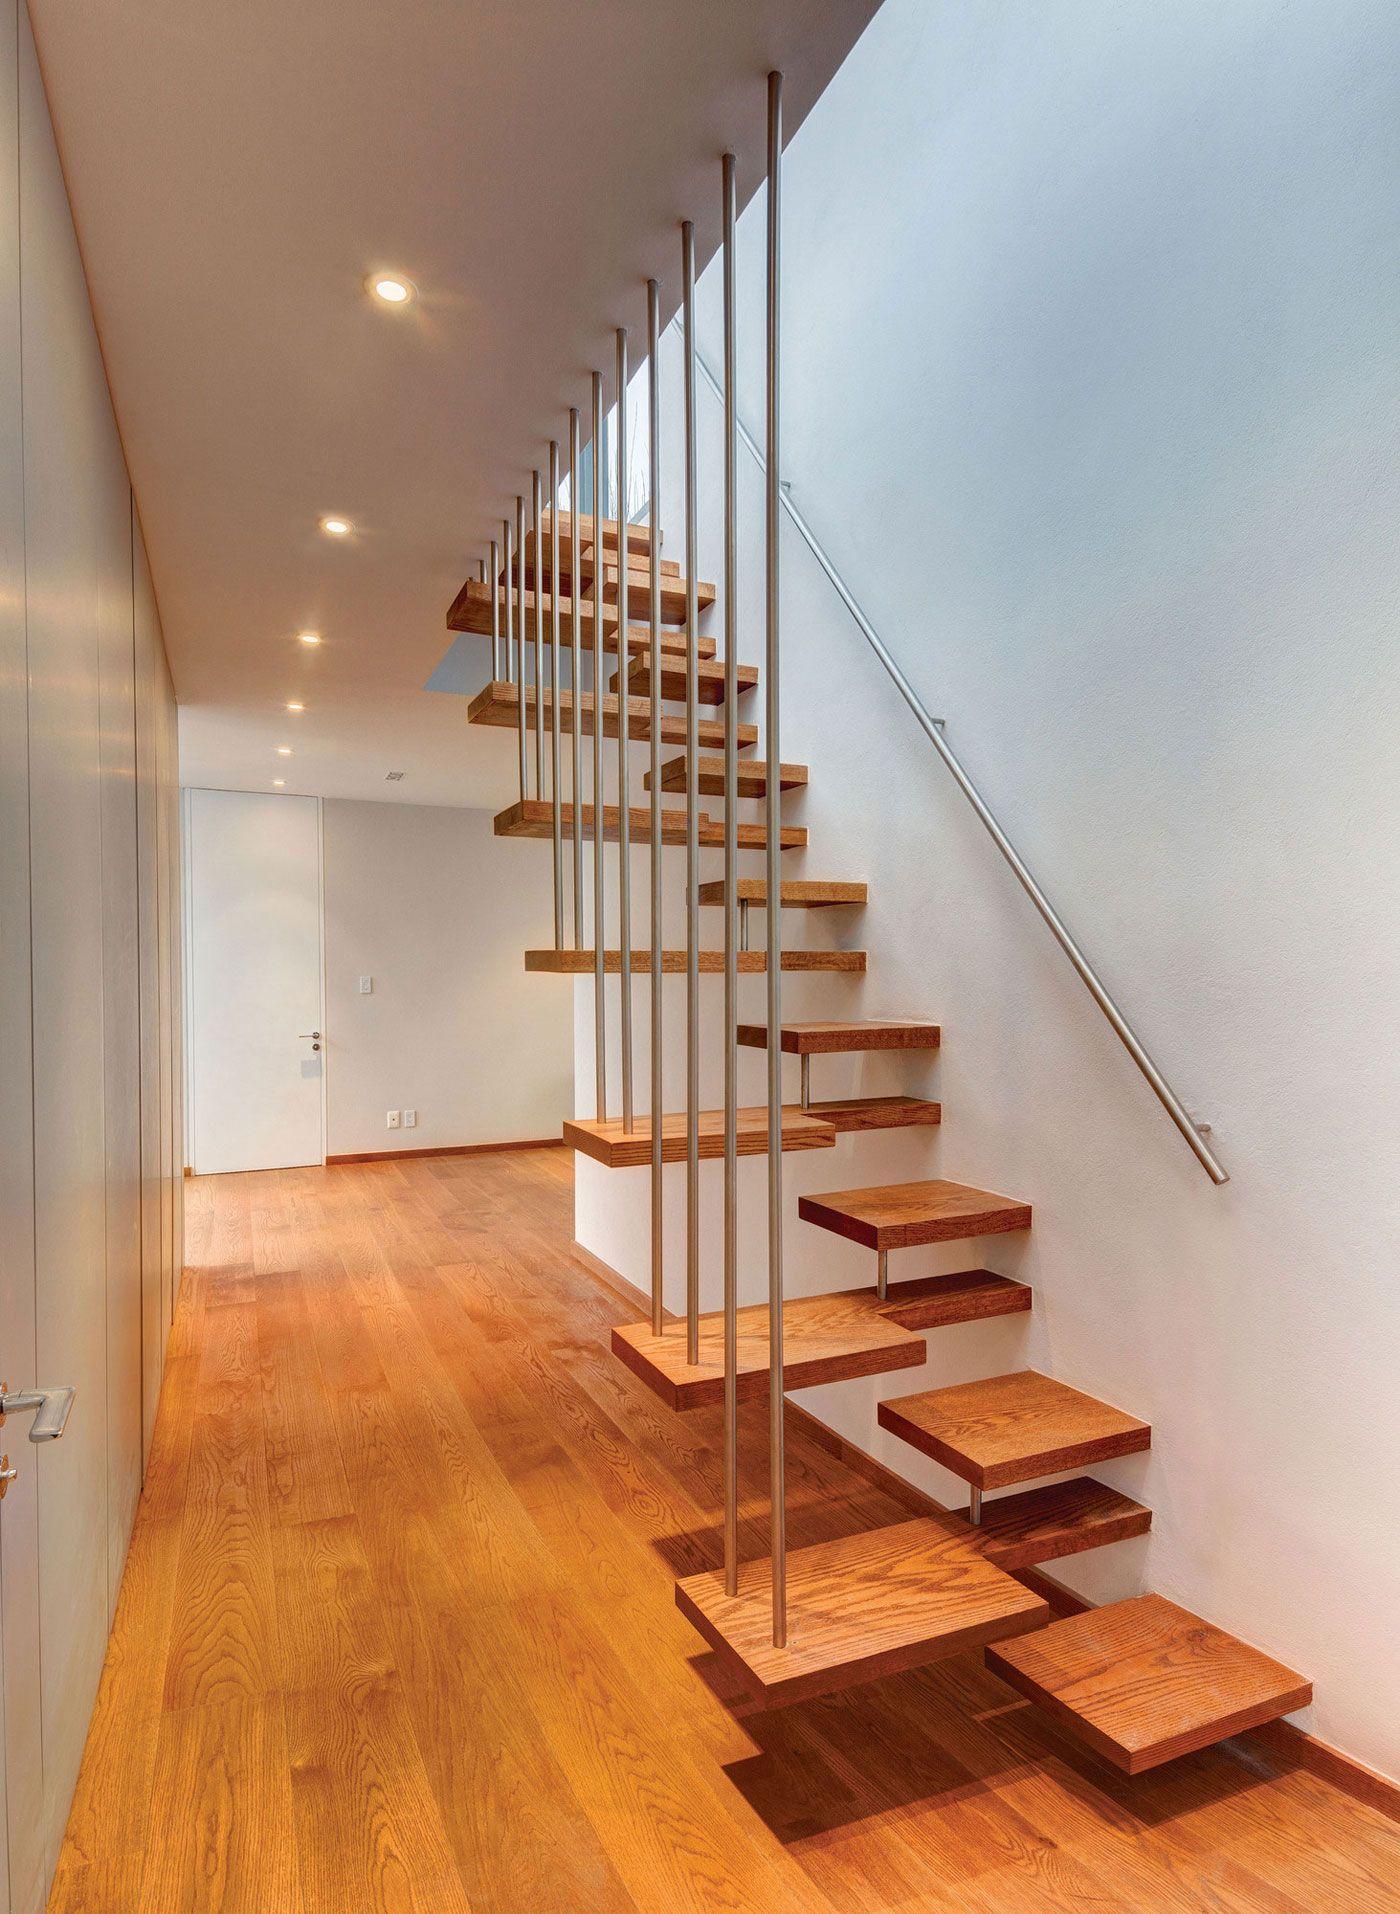 Unique And Creative Staircase Designs For Modern Homes Small Staircase Stairs Design Modern Stairs Design